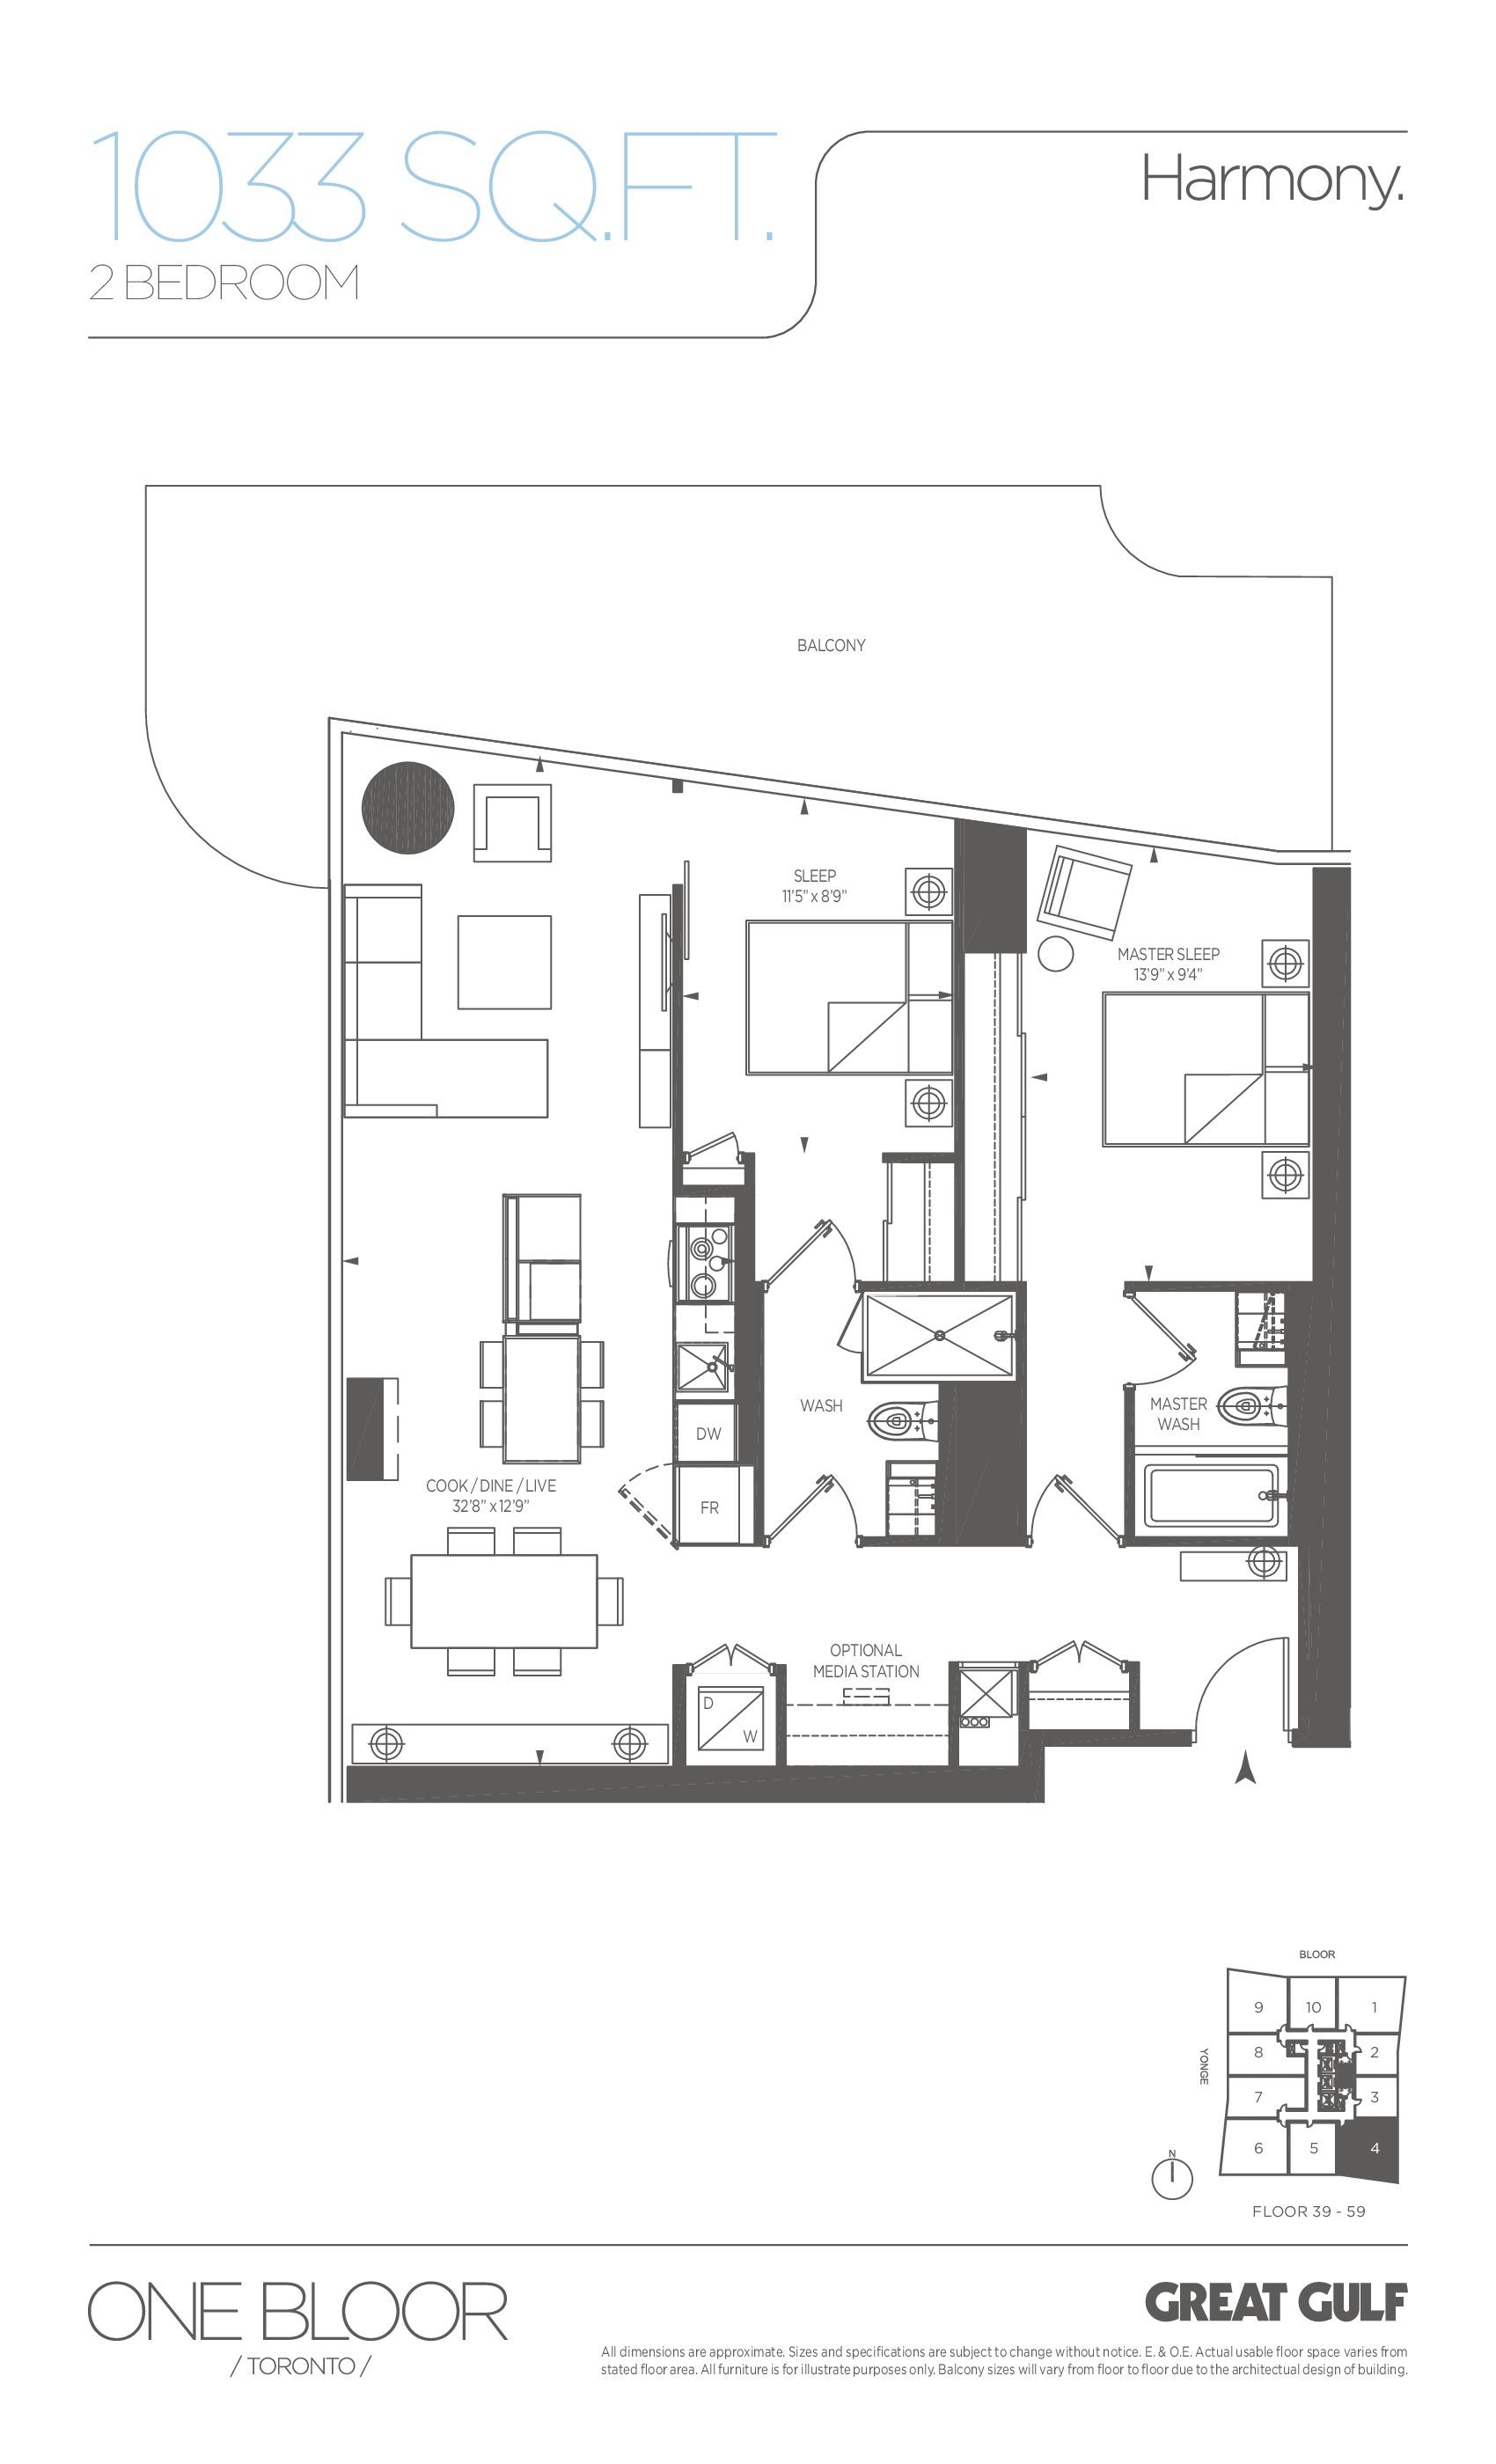 Harmony Floor Plan at One Bloor Condos - 1033 sq.ft